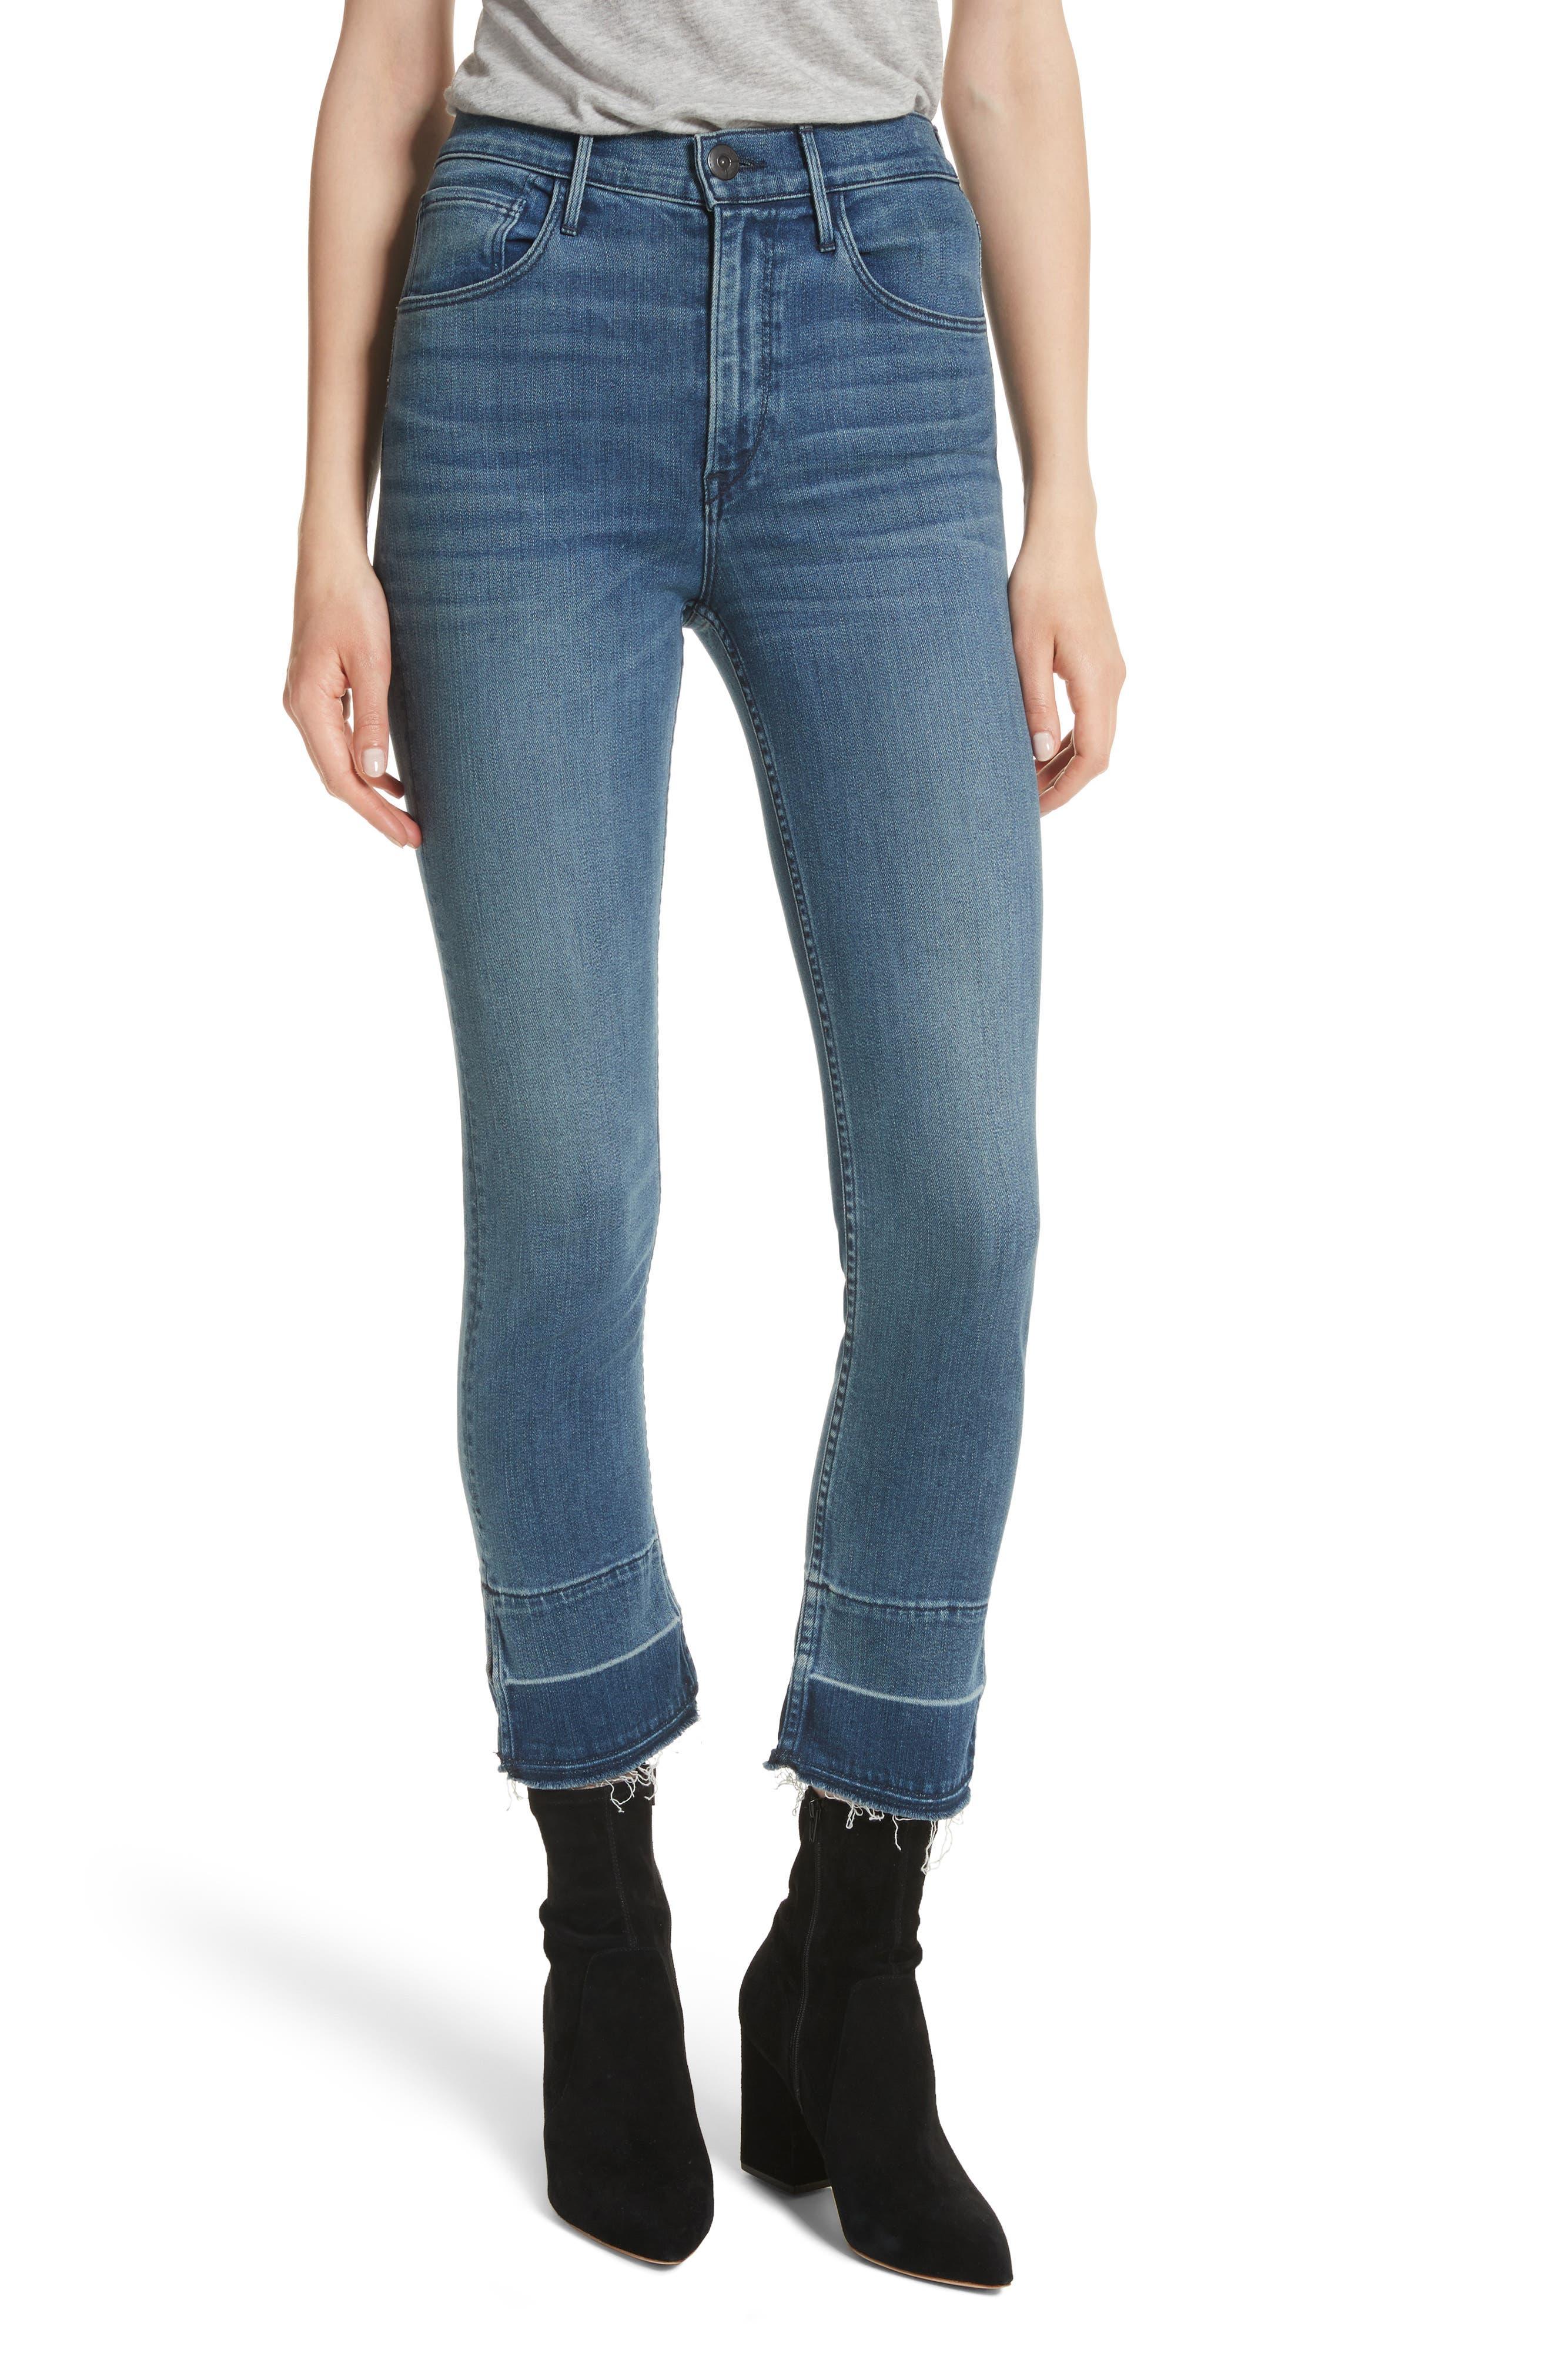 W4 Abigail Released Split Hem Ankle Skinny Jeans,                             Main thumbnail 1, color,                             427